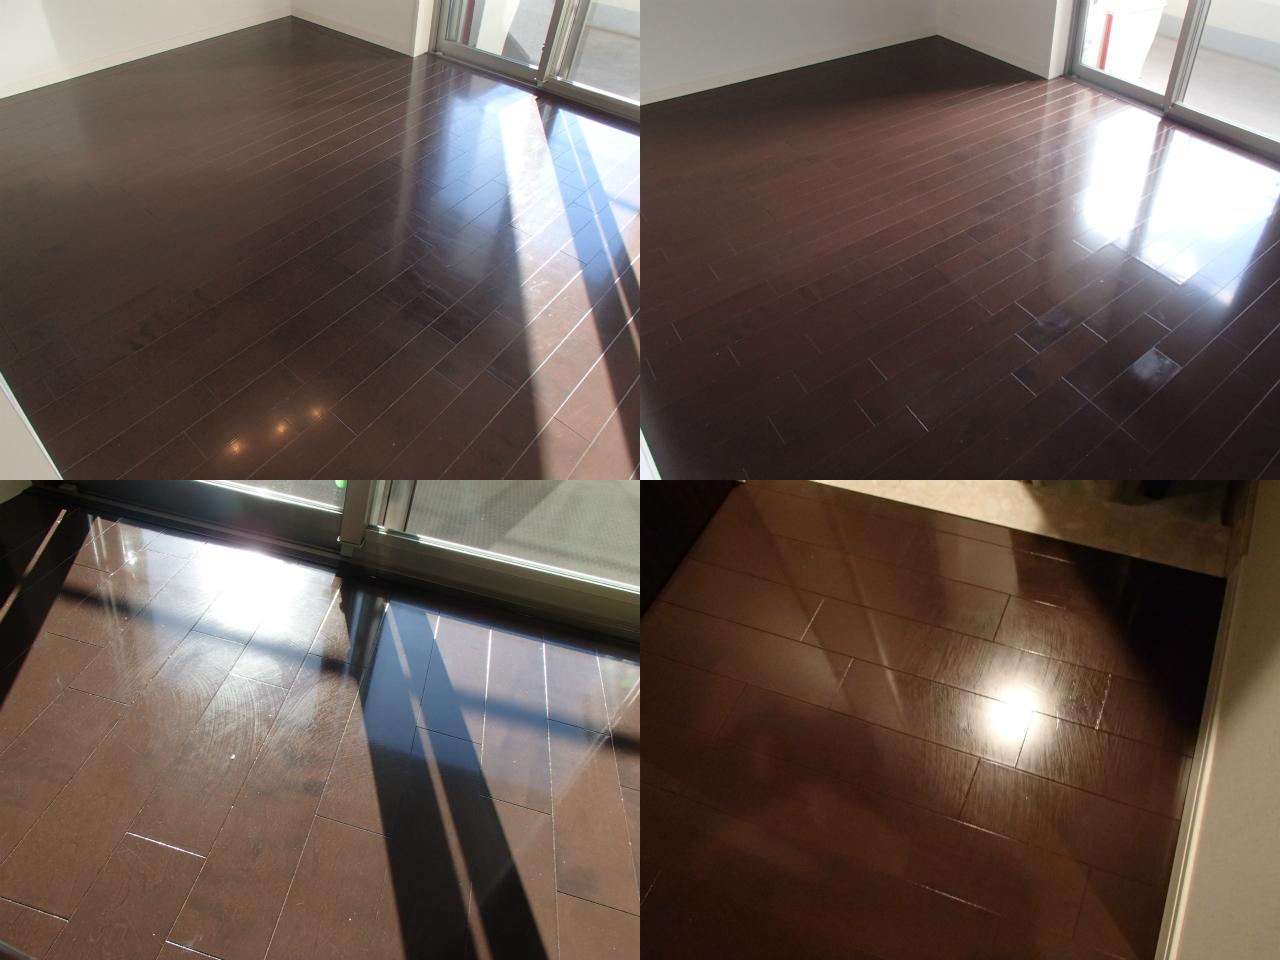 http://ajras.net/images/121229-floor1.jpg